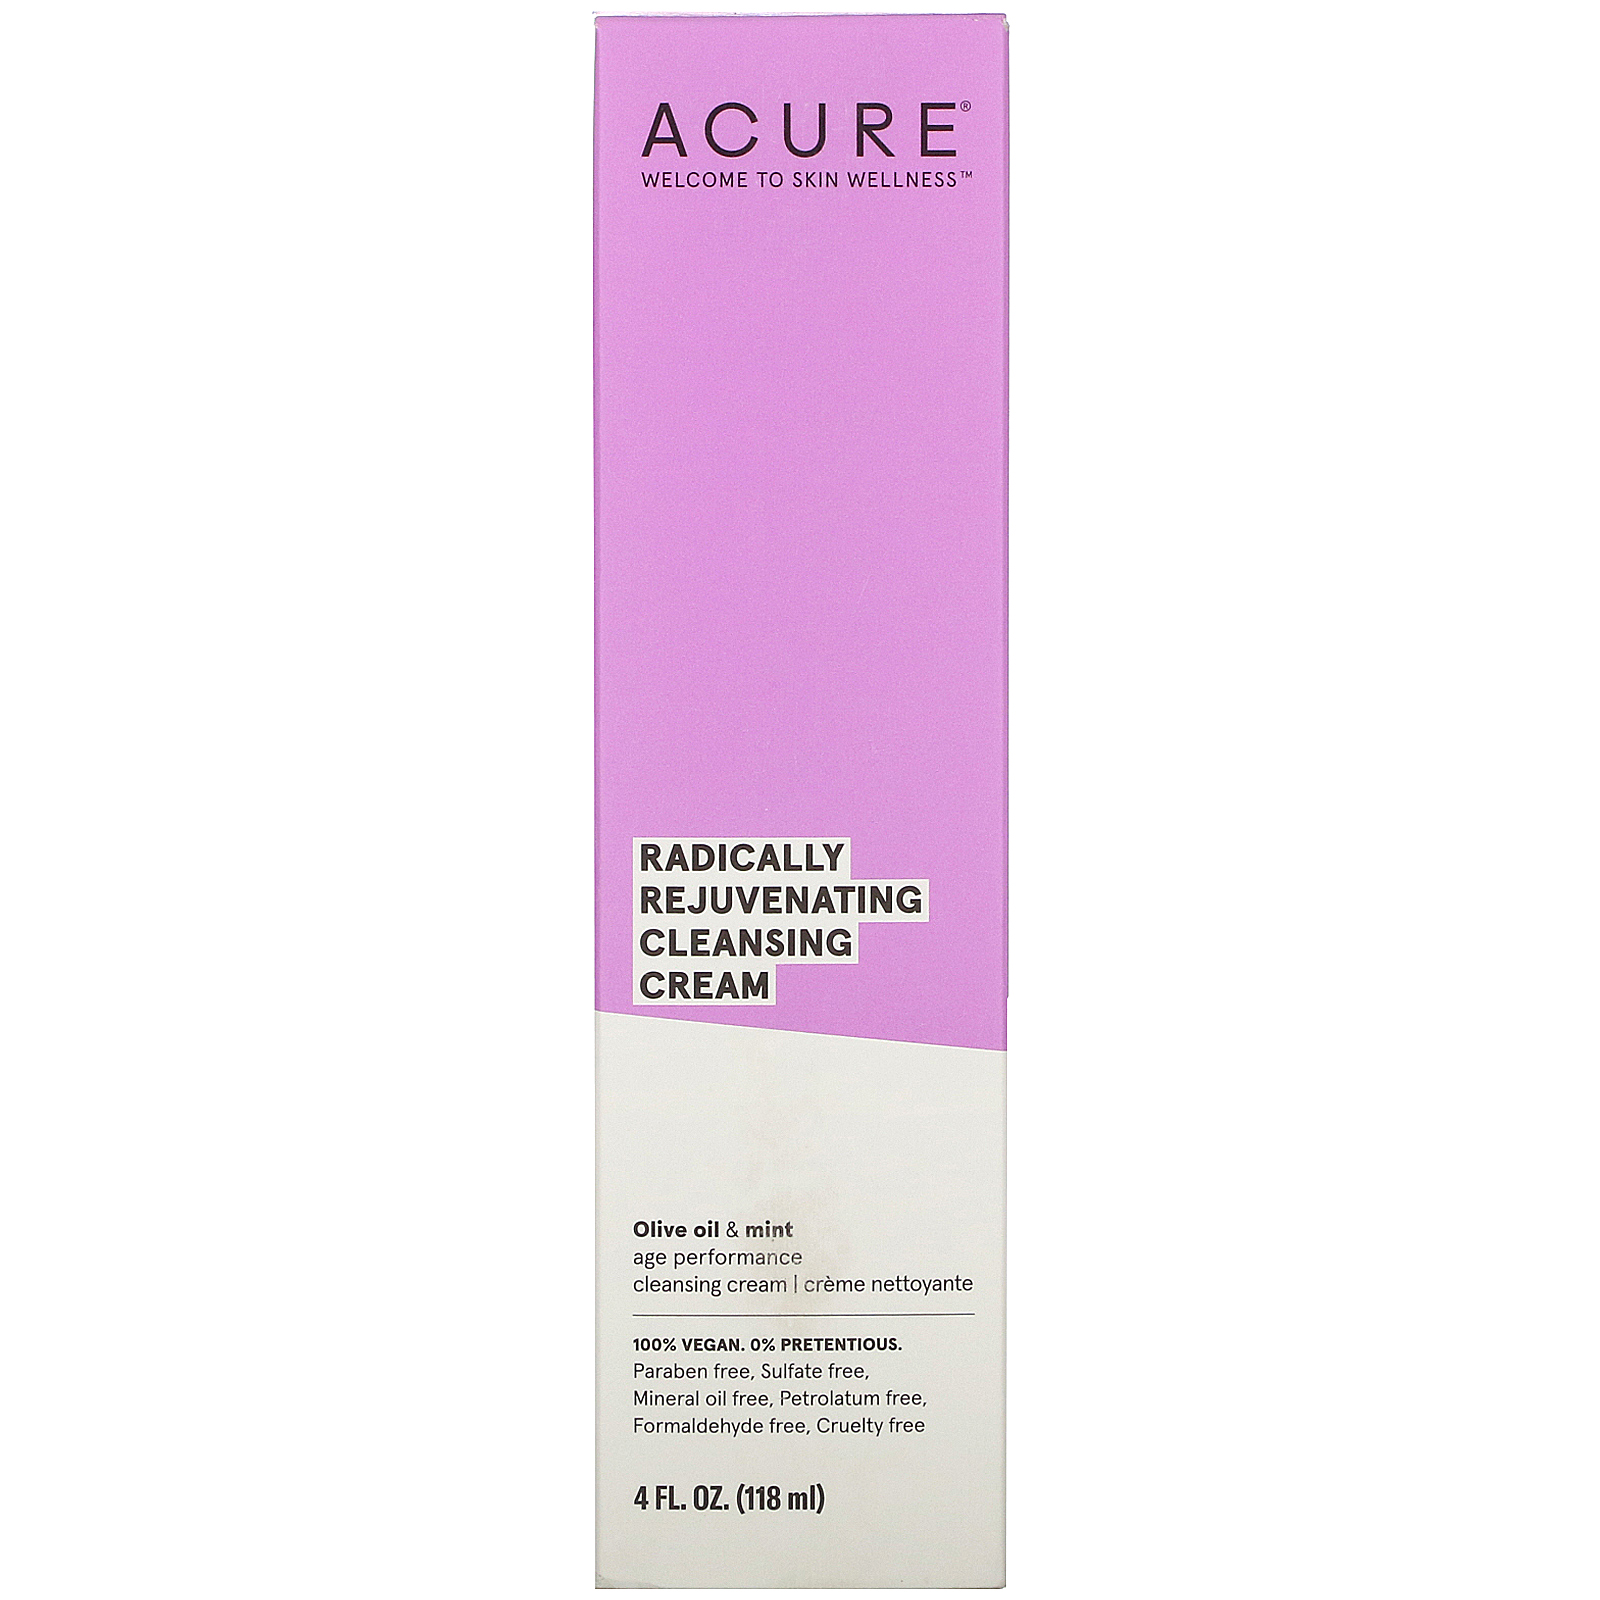 Acure, Radically Rejuvenating Cleansing Cream, 4 Fl Oz